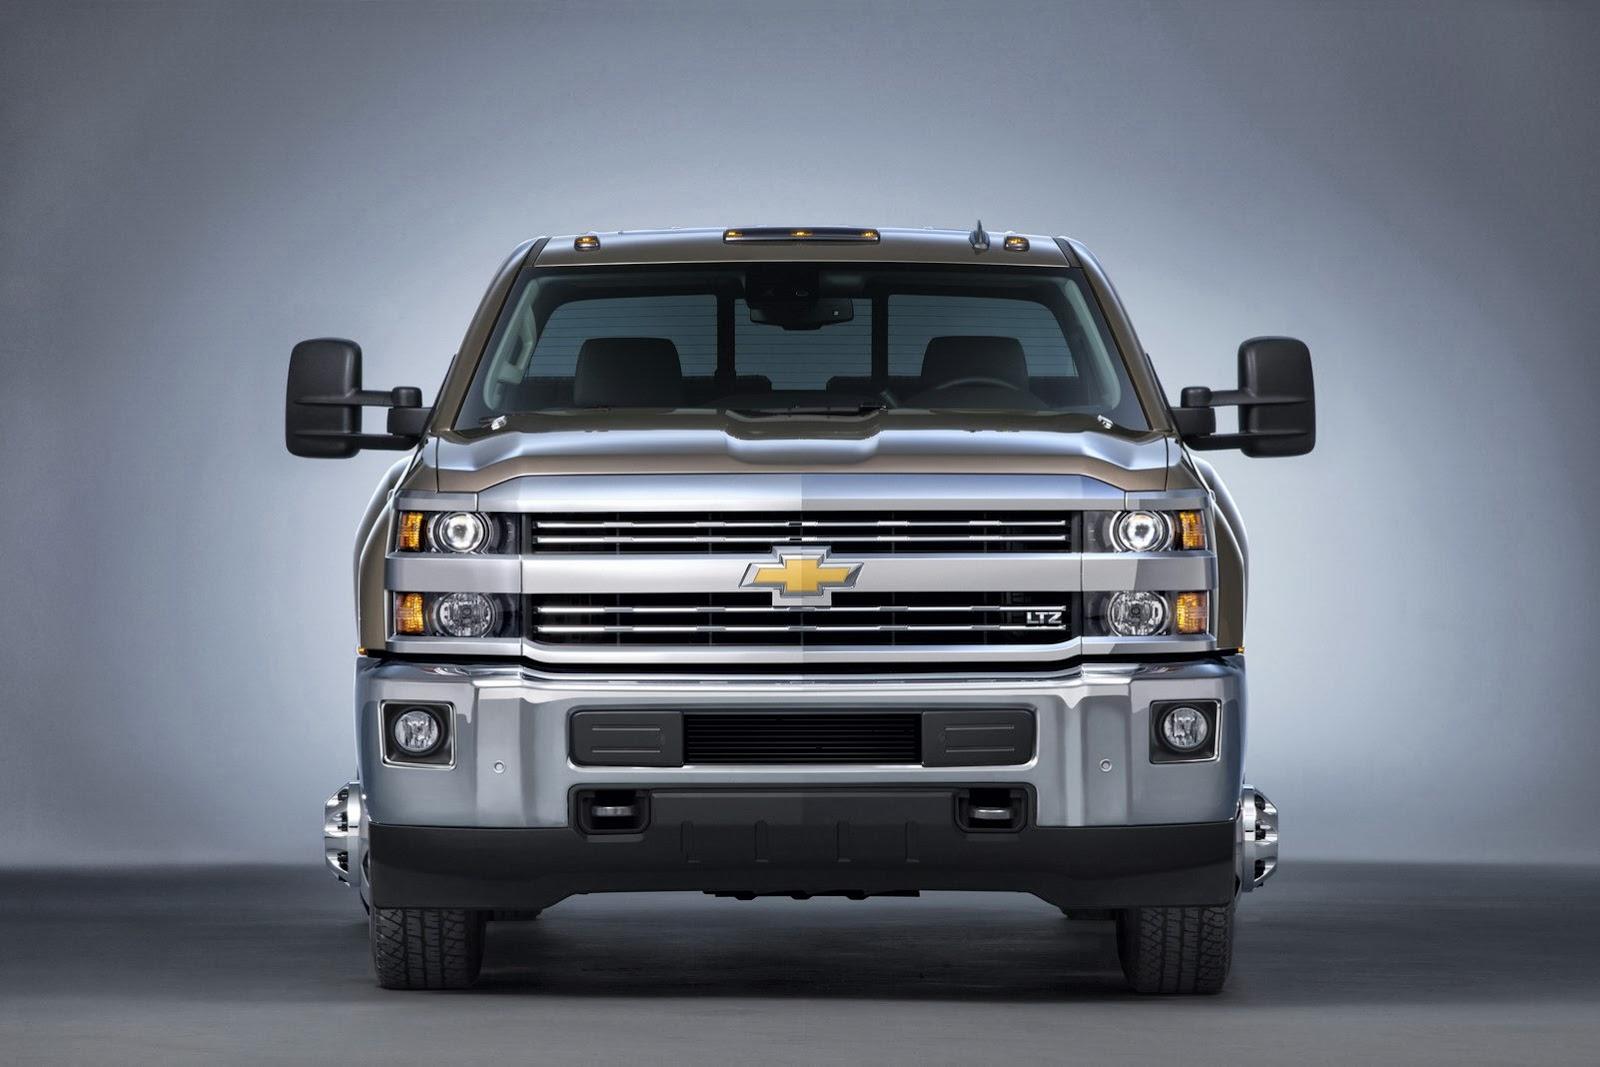 2015-Chevrolet-Silverado-3500-HD-12%25255B2%25255D.jpg